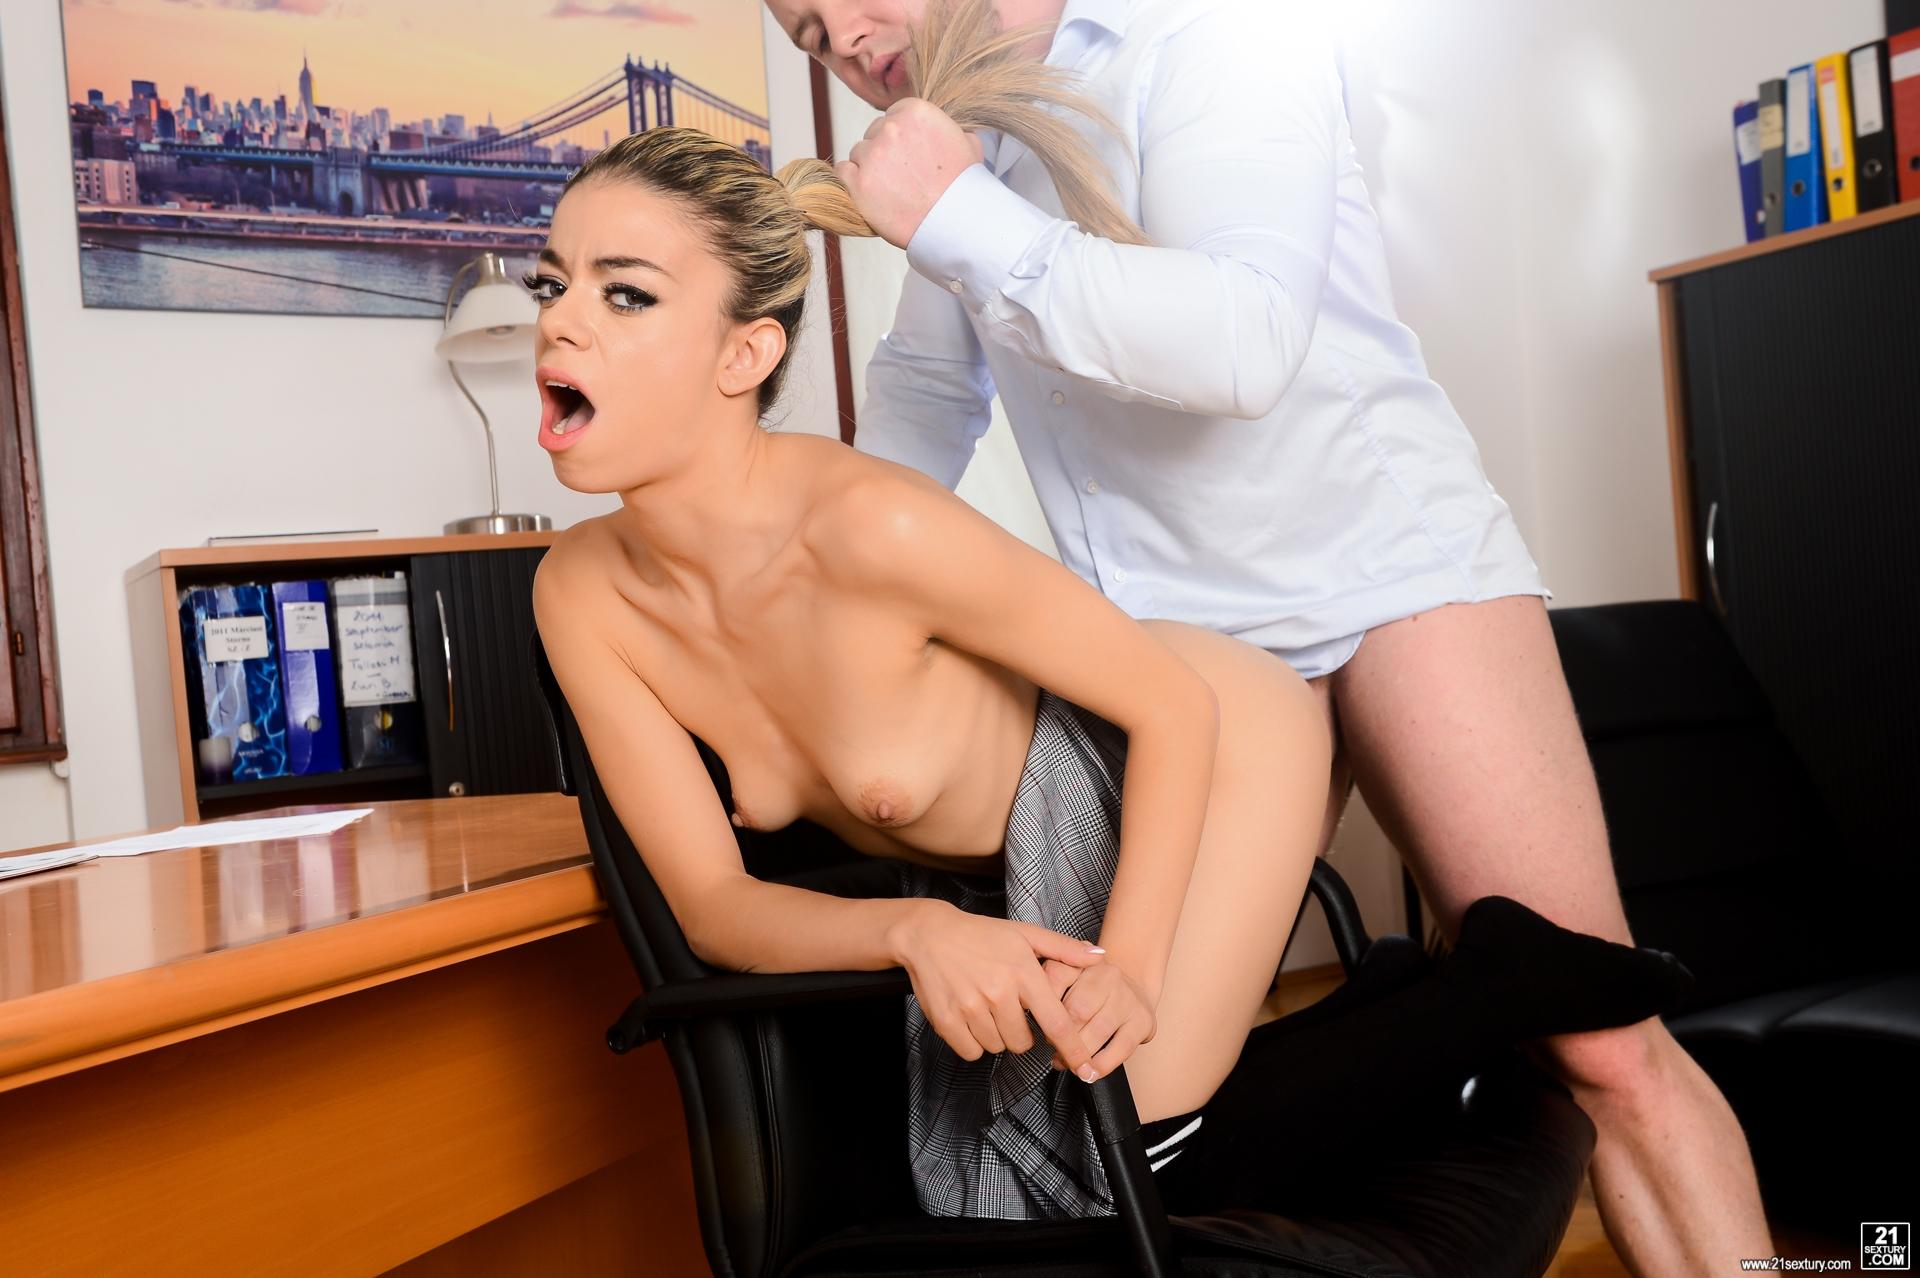 Anal Pornofotos. Galerie № 1265. Foto - 12